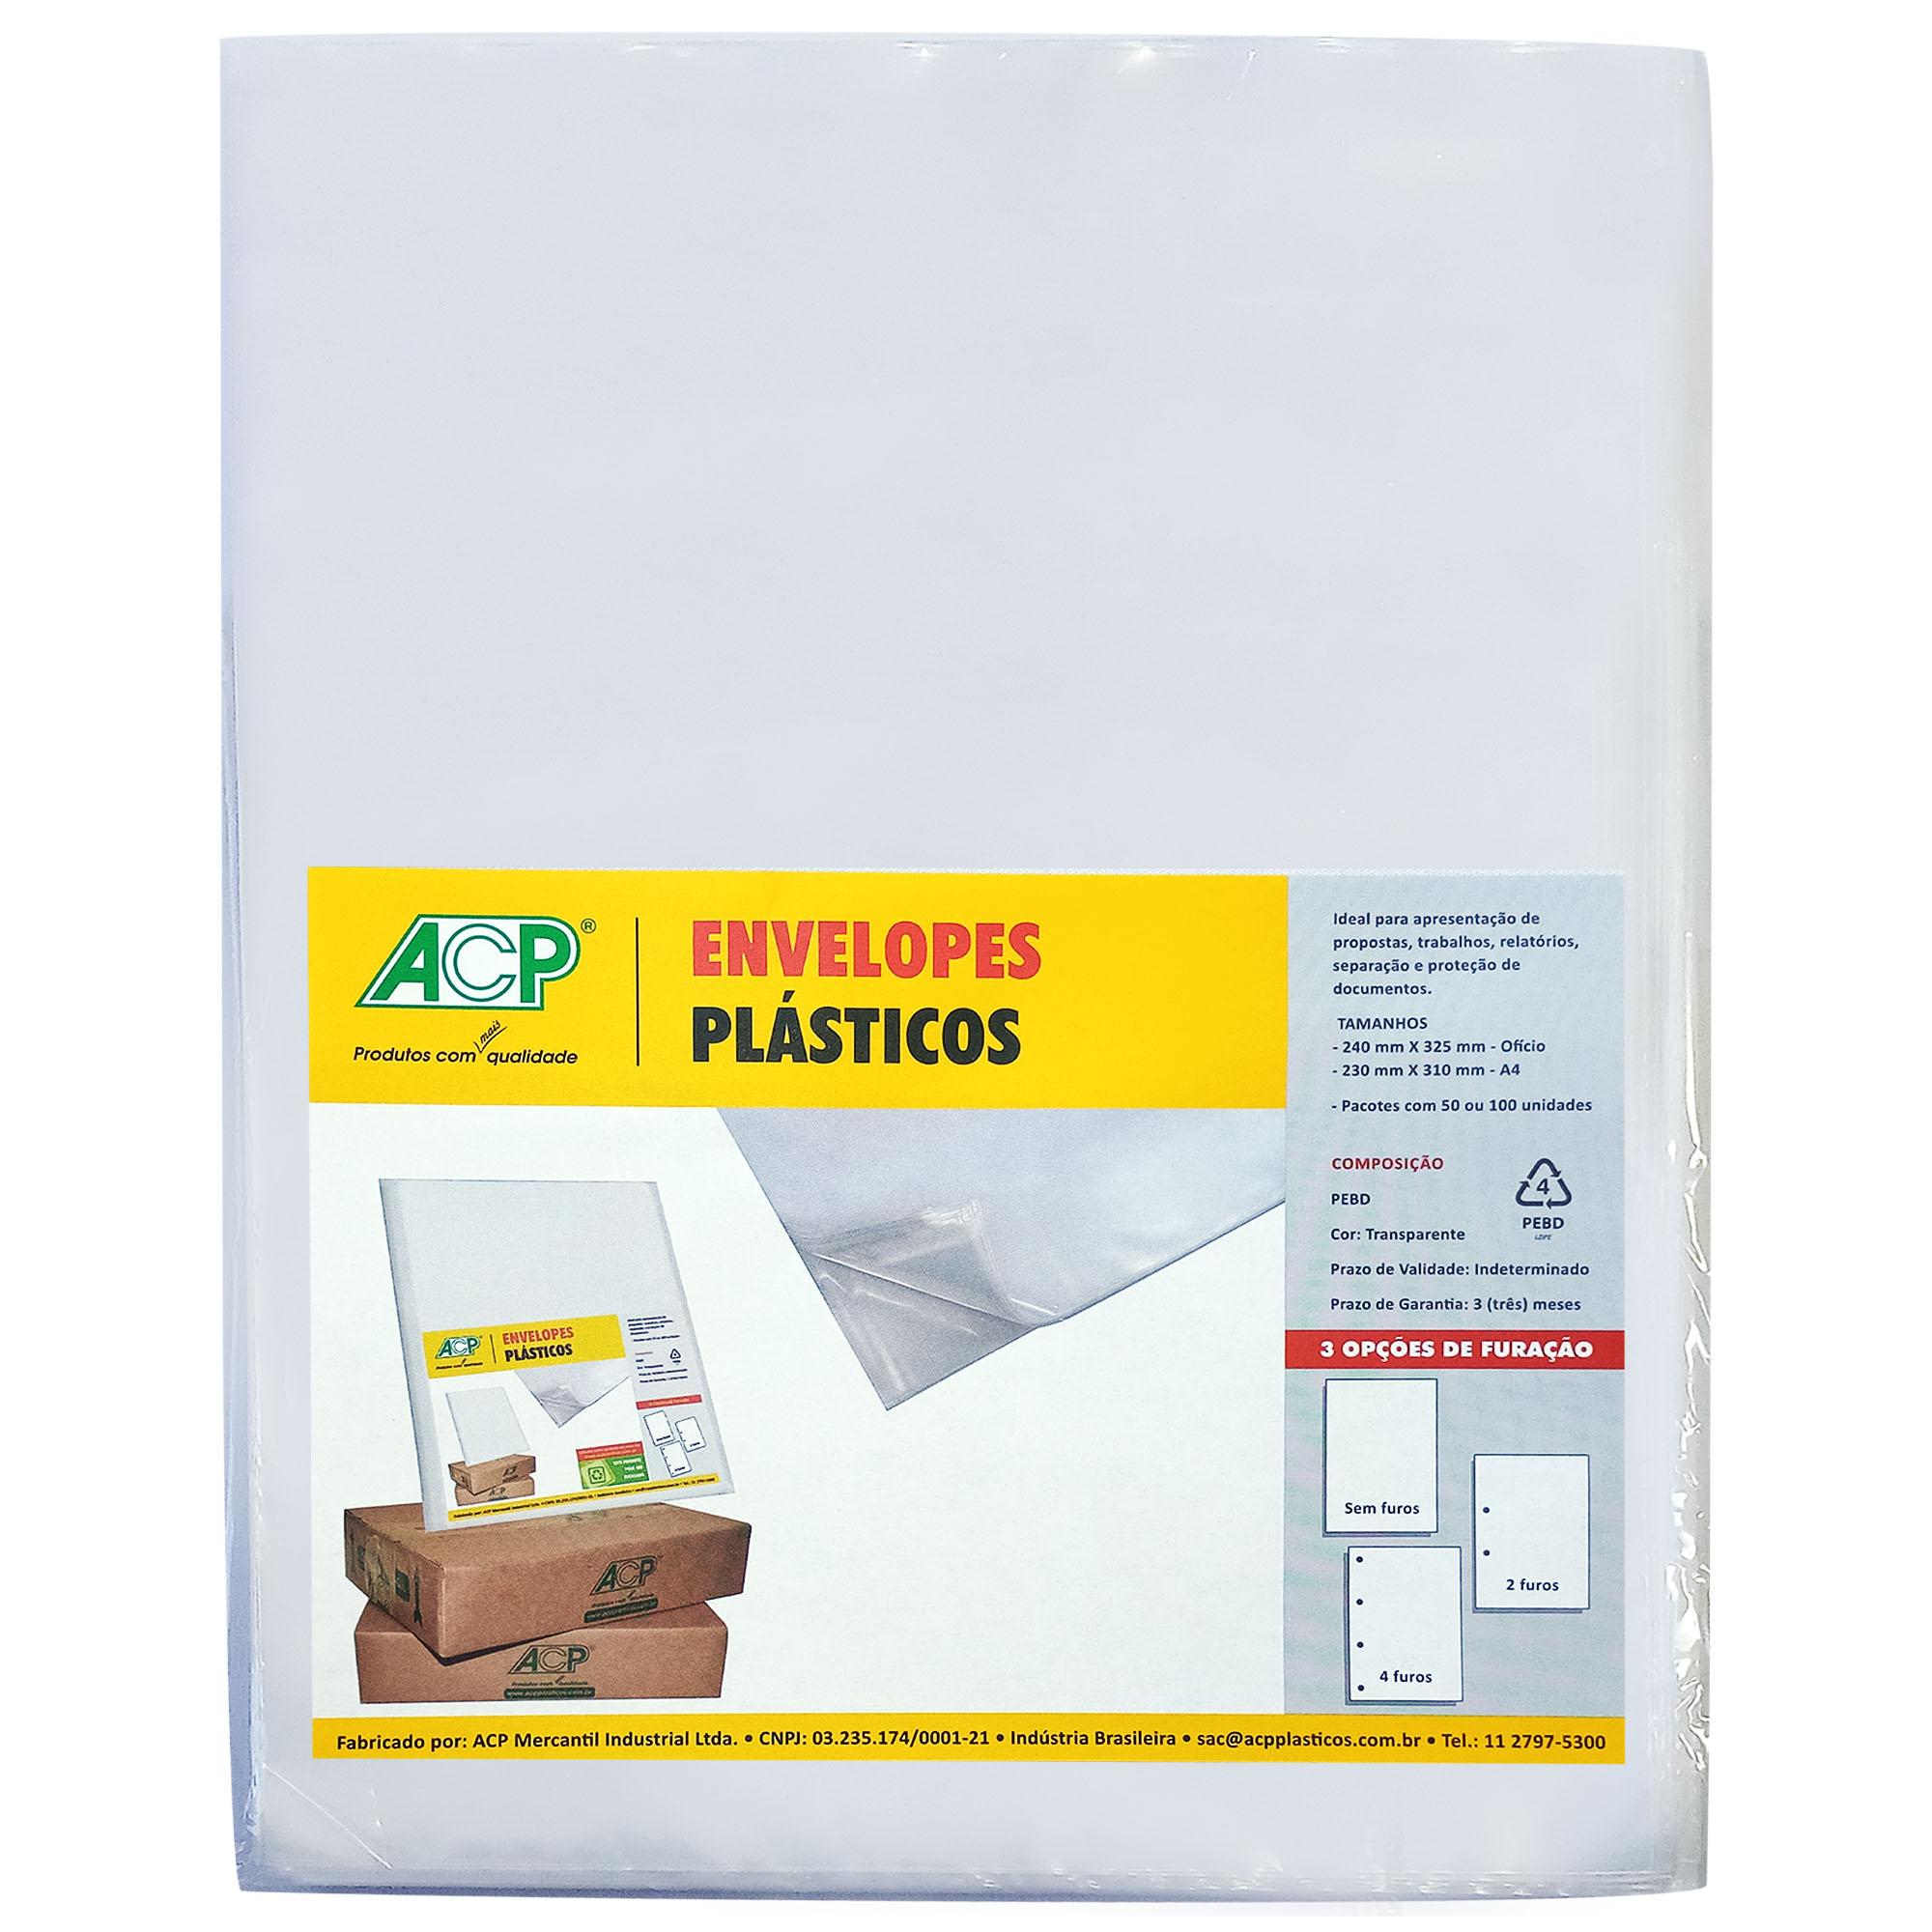 Envelope Saco Plastico tamanho A4 4 furos 0,12mm c/ 100 unid - Acp